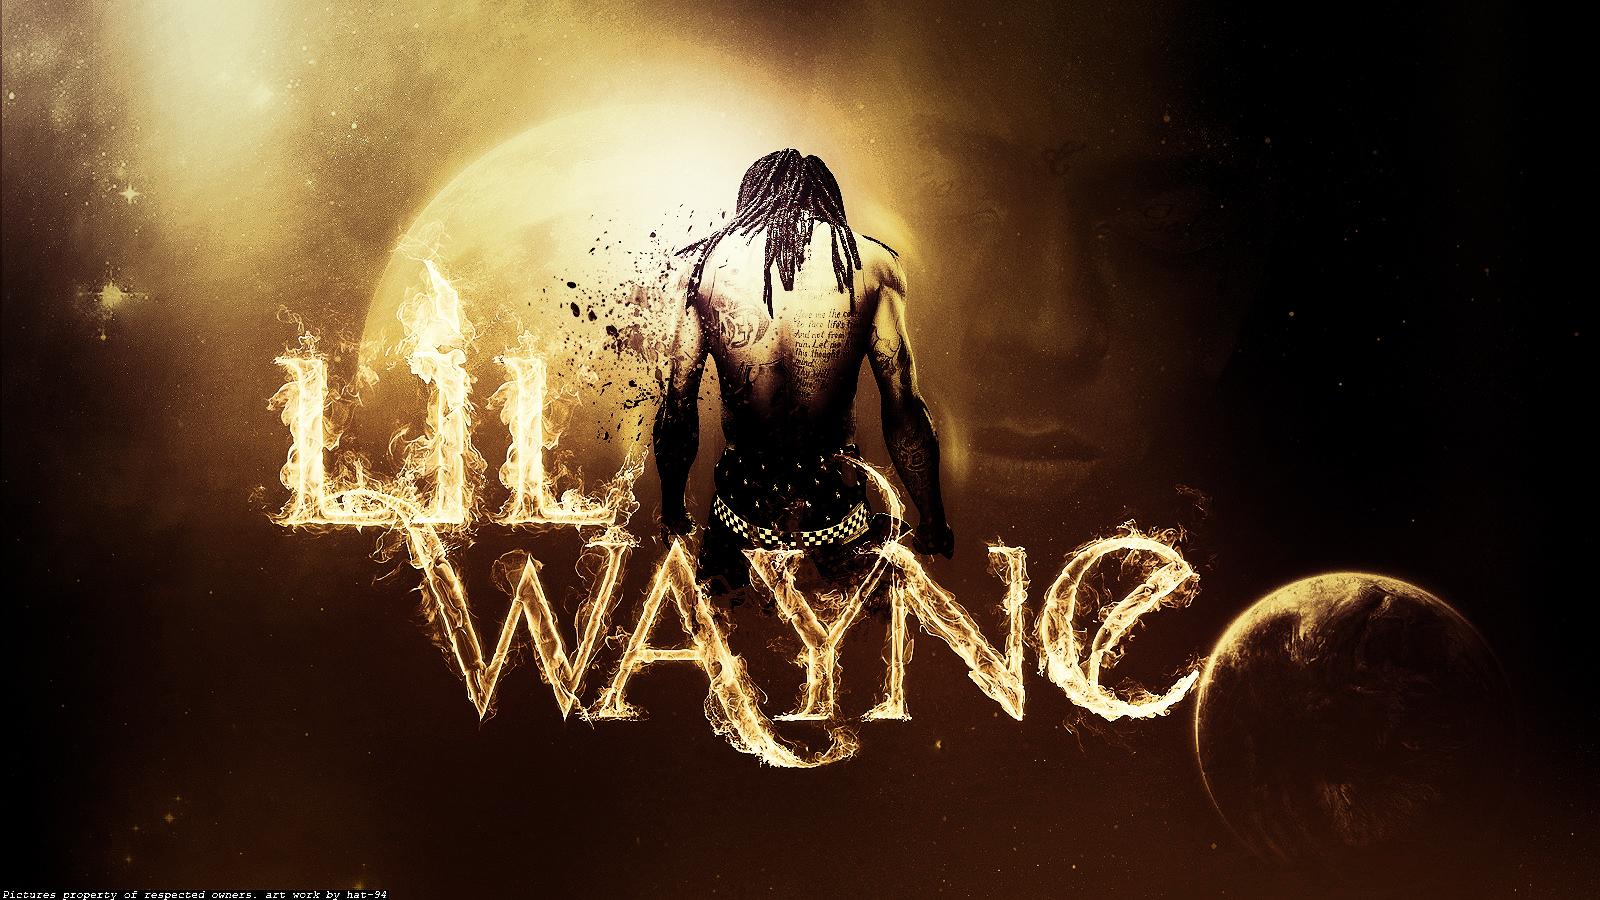 http://2.bp.blogspot.com/-o3p1SmnVYAg/TelA6pu50CI/AAAAAAAAAMk/QtGH8B7gr9Y/s1600/Lil+Wayne+Wallpaper3.jpg